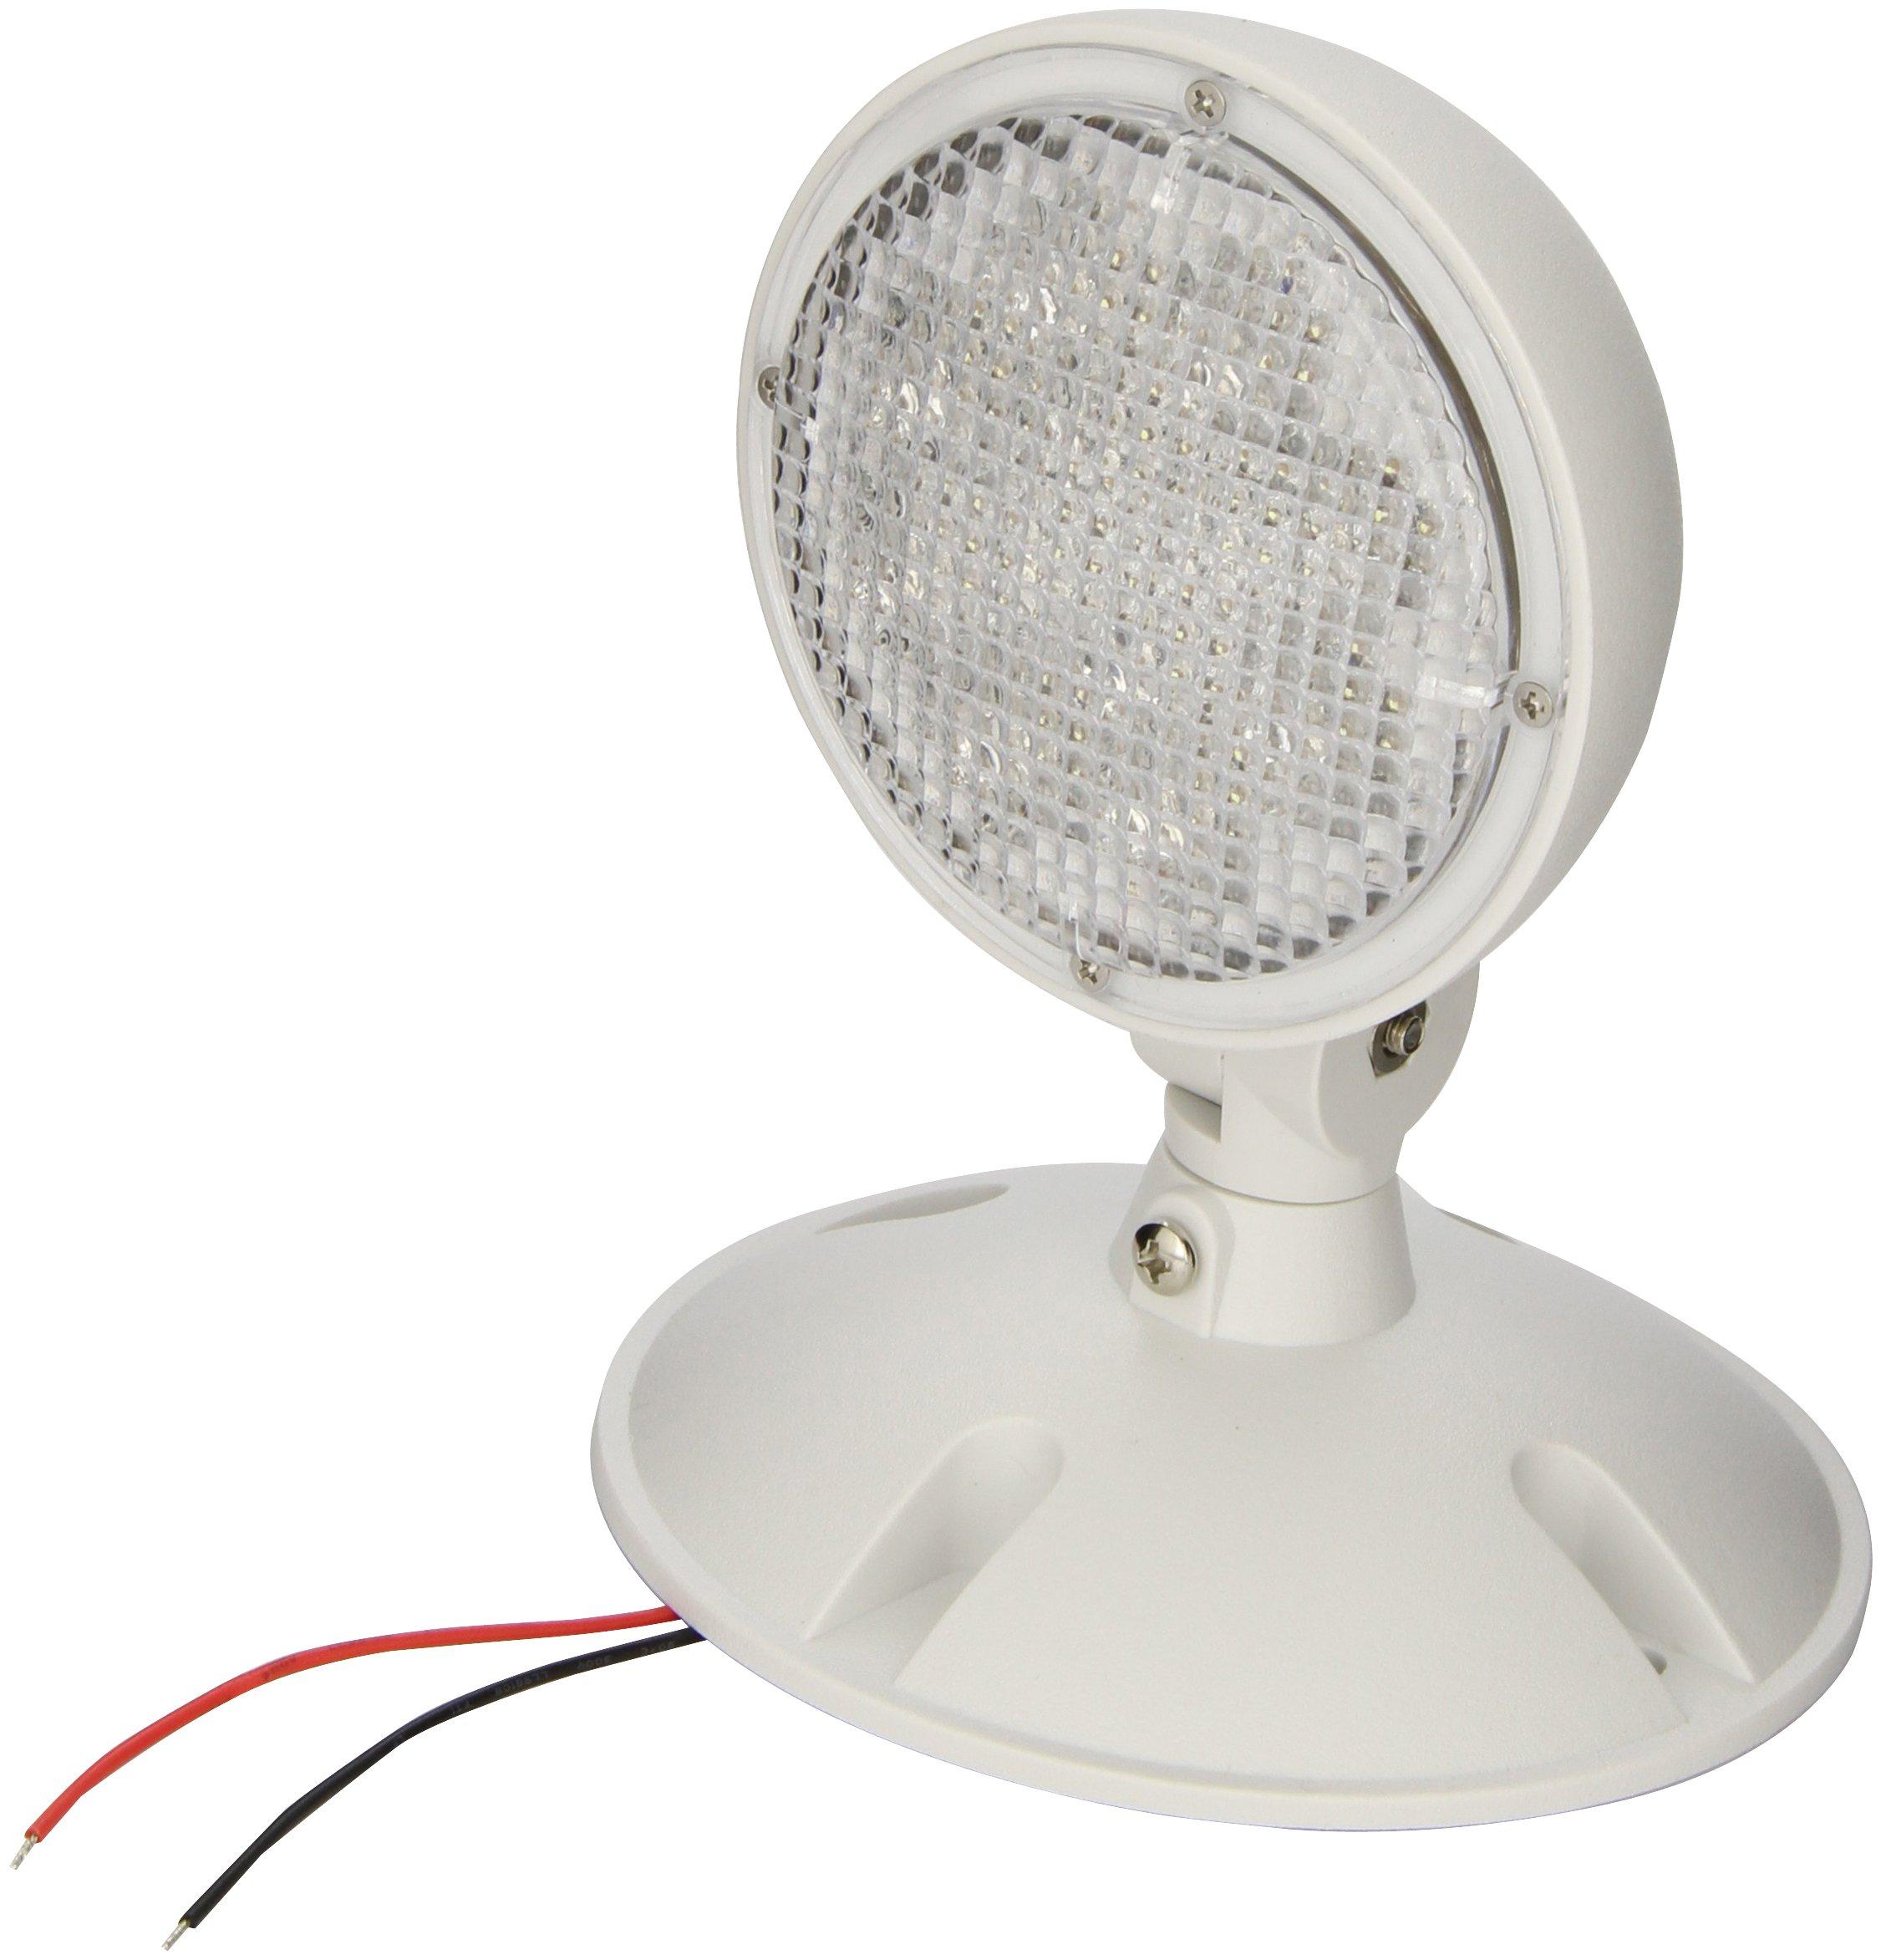 Morris Products 73126 Remote Emergency Light Head 1 3.6V 1.7W LED Lamp Weatherproof